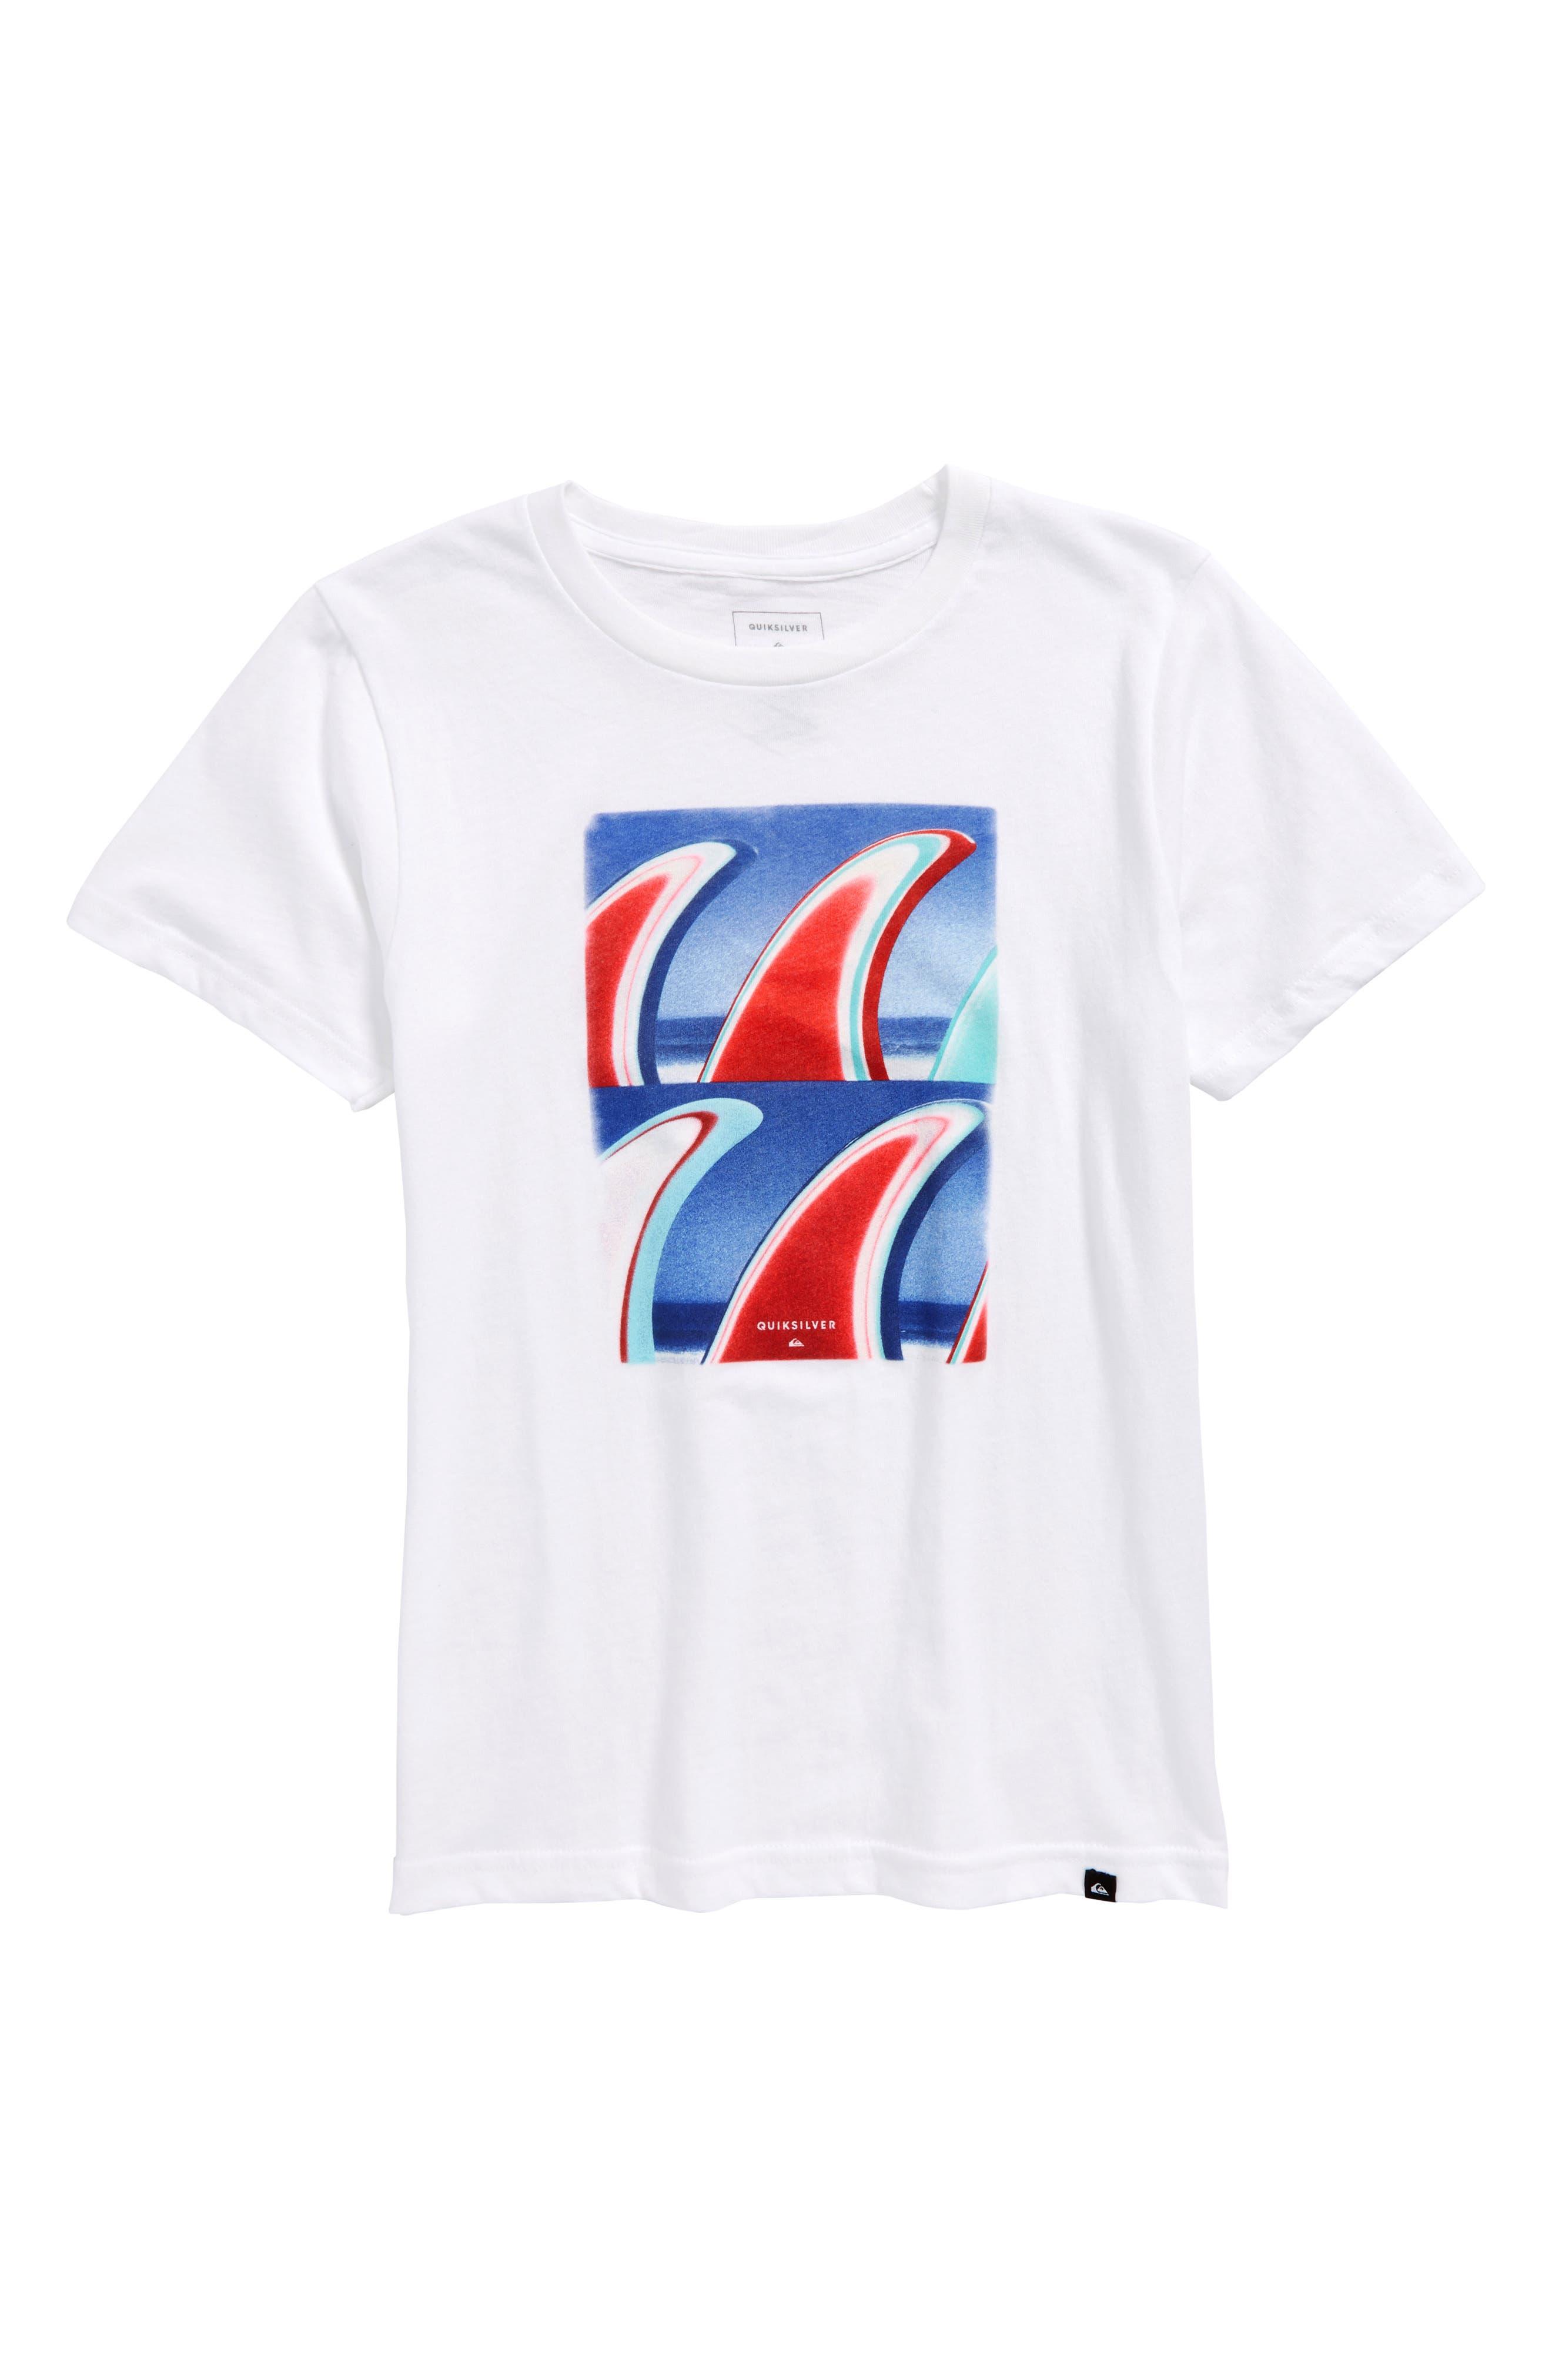 Fin Finatic Graphic T-Shirt,                         Main,                         color,